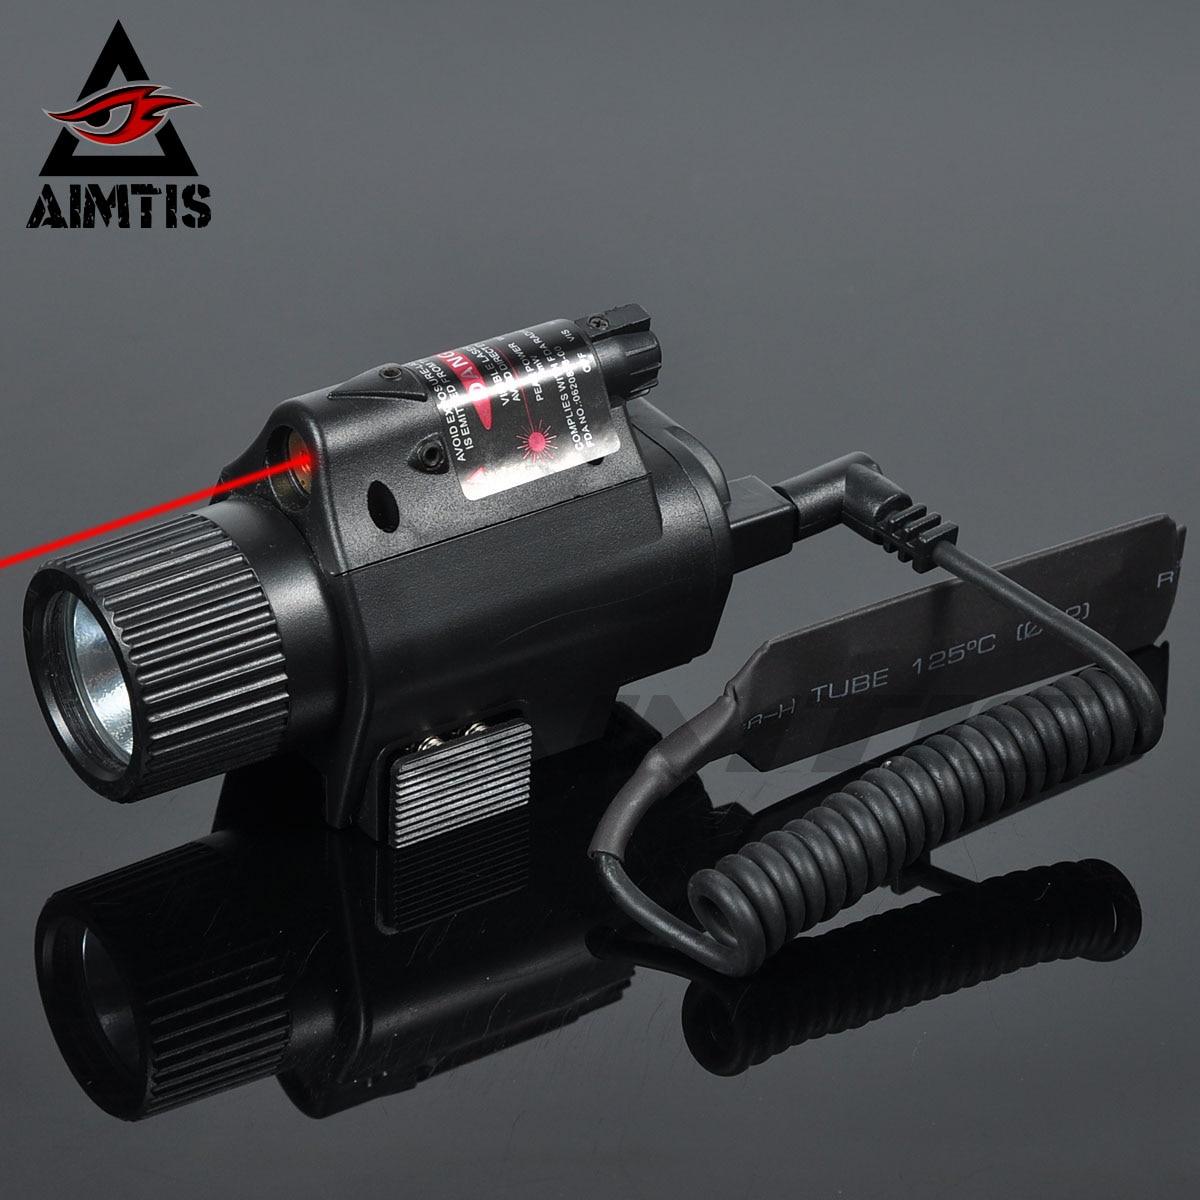 AIMTIS Mini Glock Pistol Gun Light Hunting Camping Gun Lighting Equipment Flashlight Tactical Sight Red Laser LED Flashlight